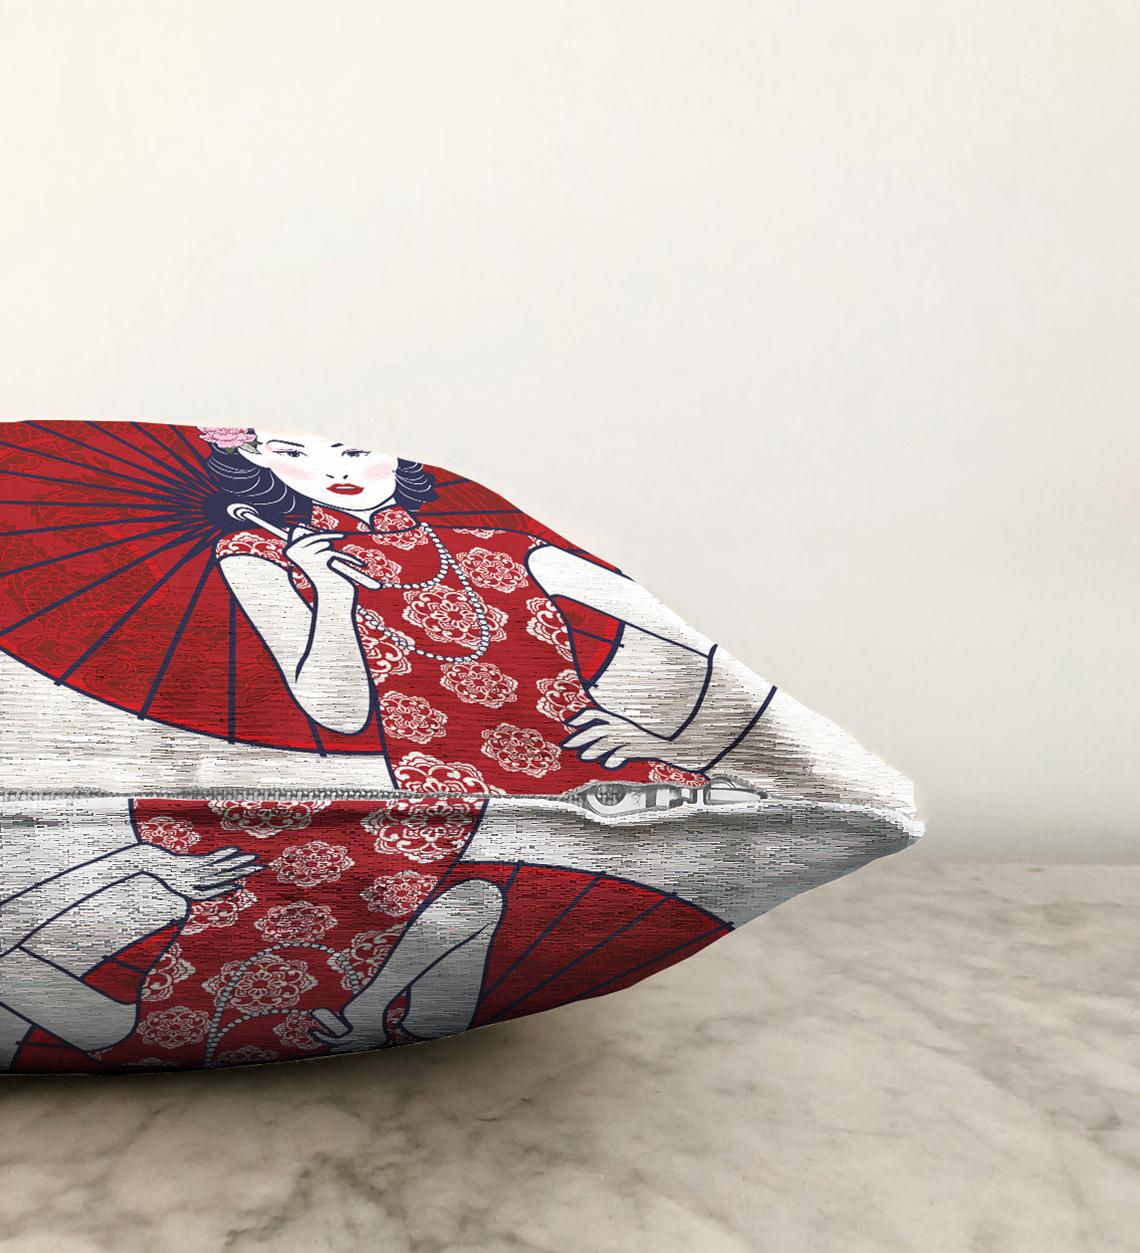 Çift Taraflı Sırtında Kırmızı Şemsiyeli Japon Kadın Motifli Şönil Kırlent Kılıfı - 55 x 55 cm Realhomes